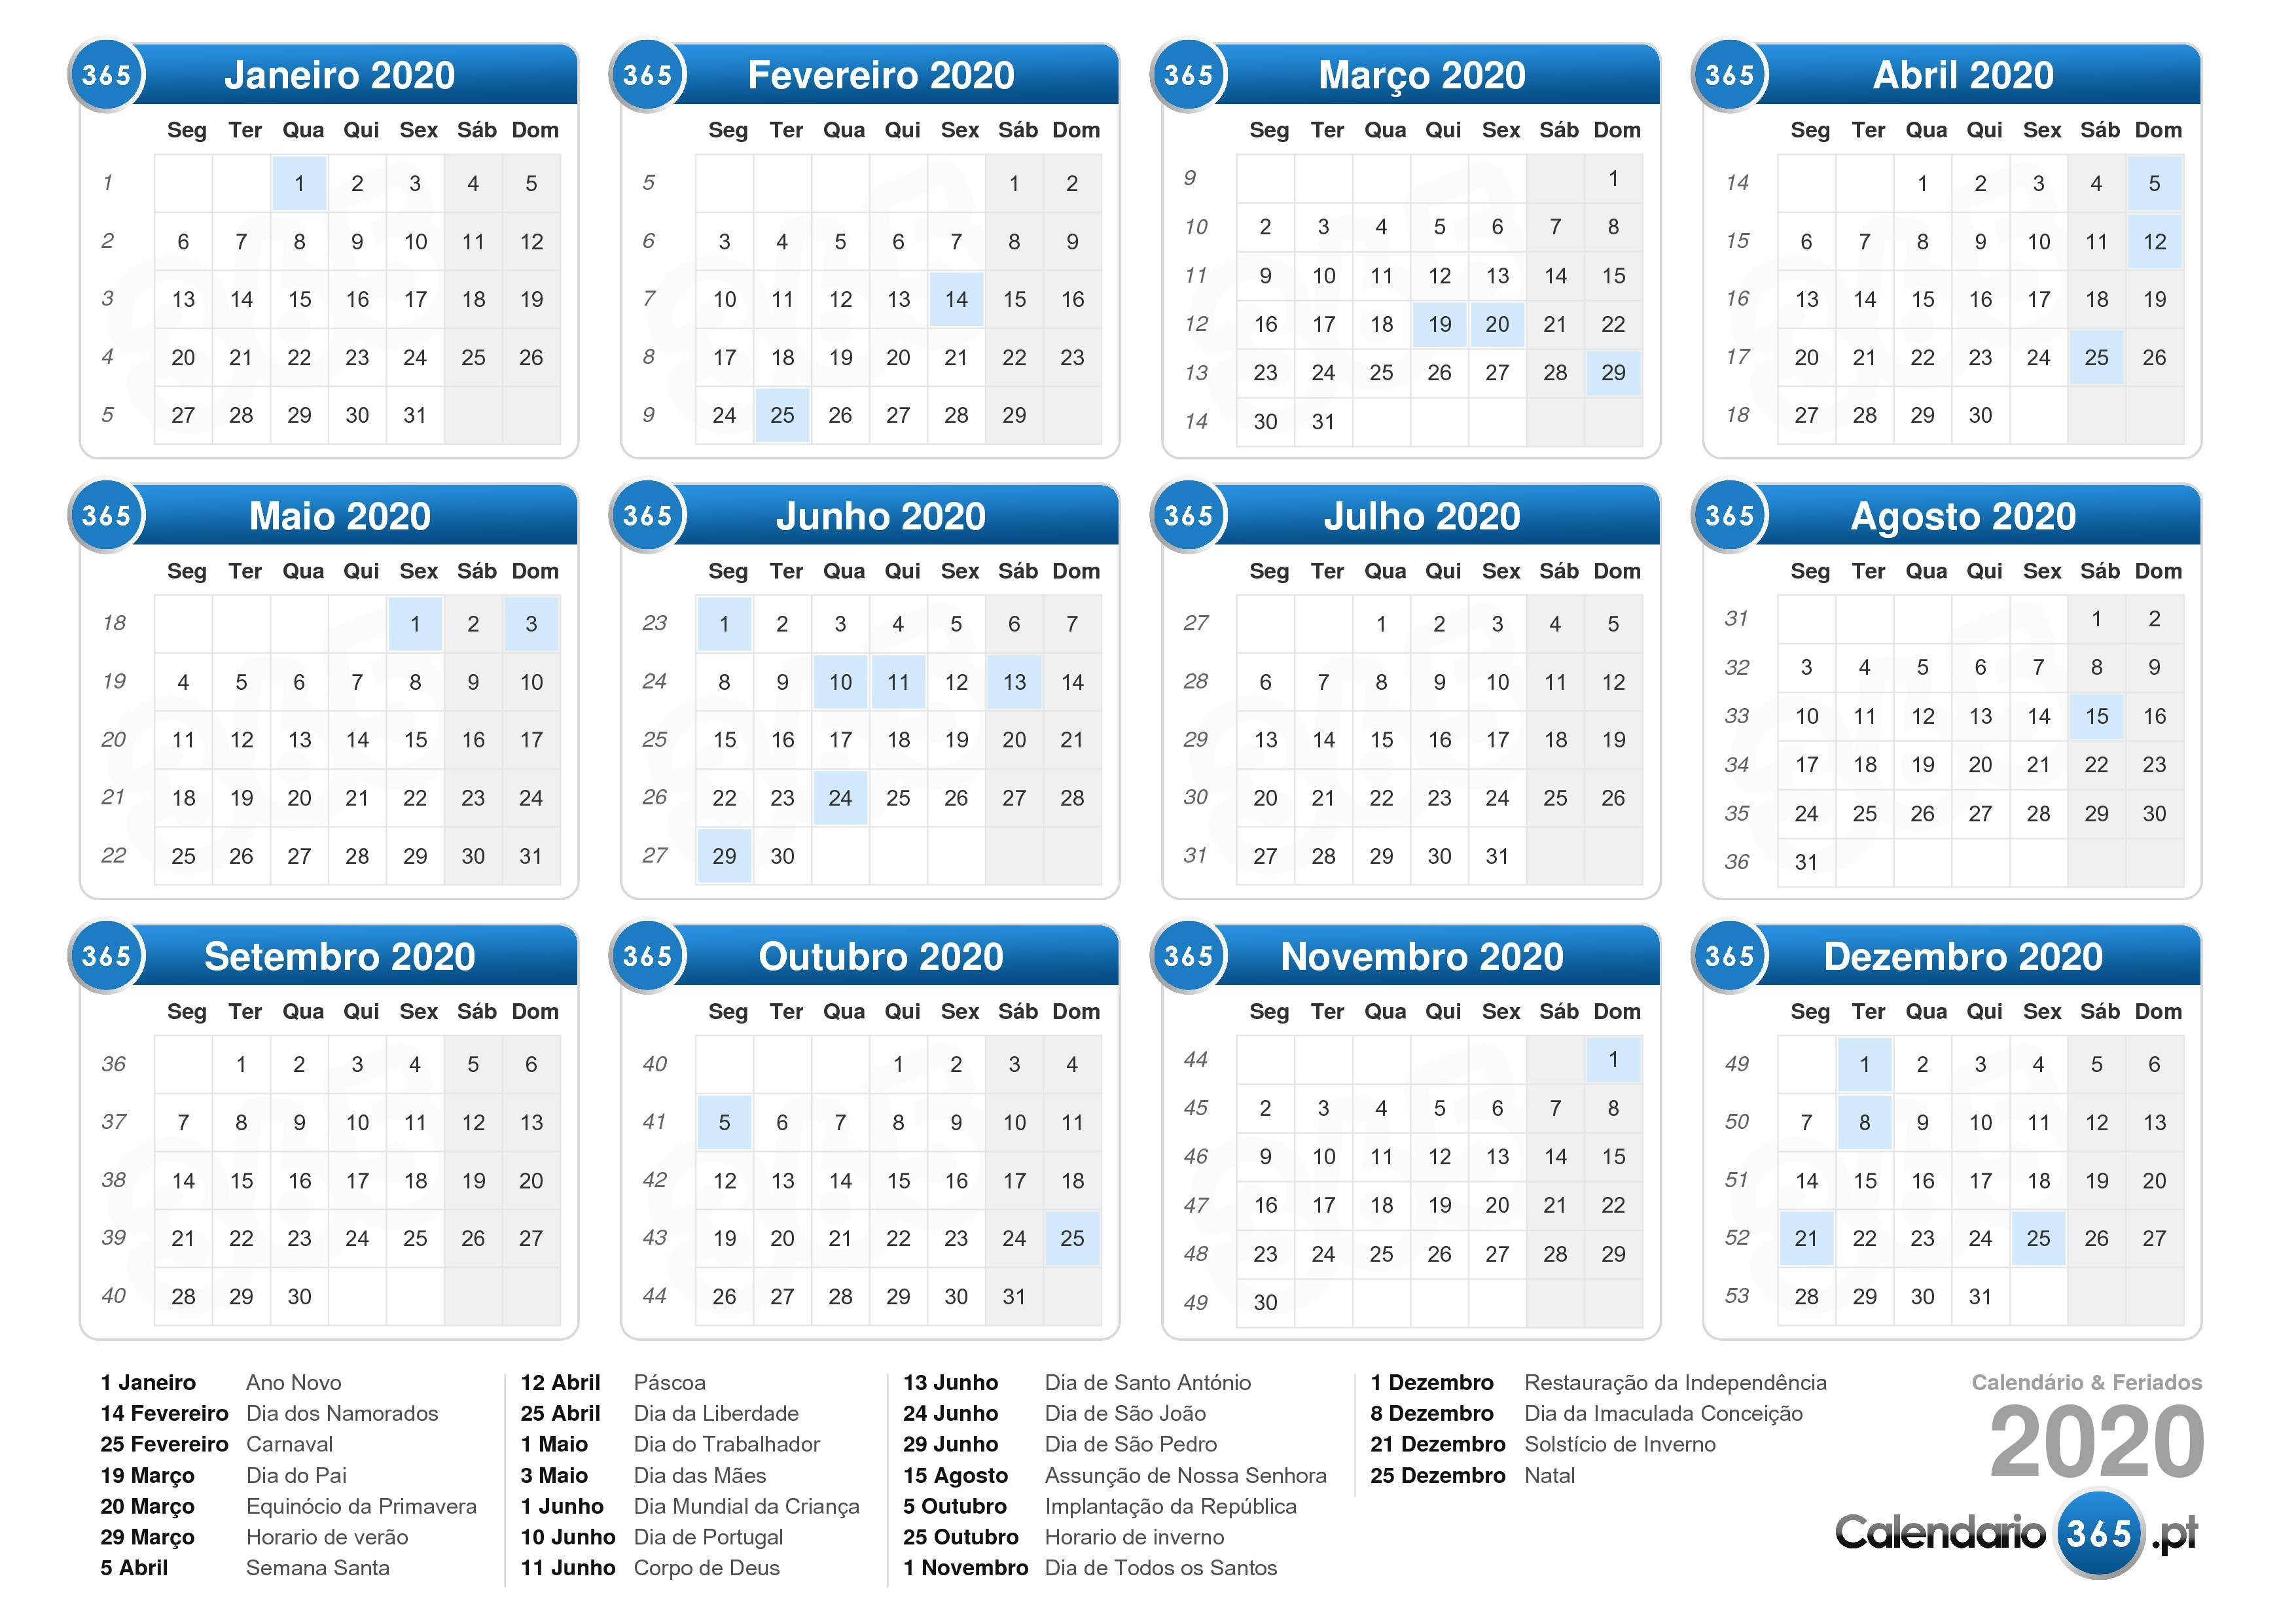 Calendario Pastorale 2020.Calendario 2020